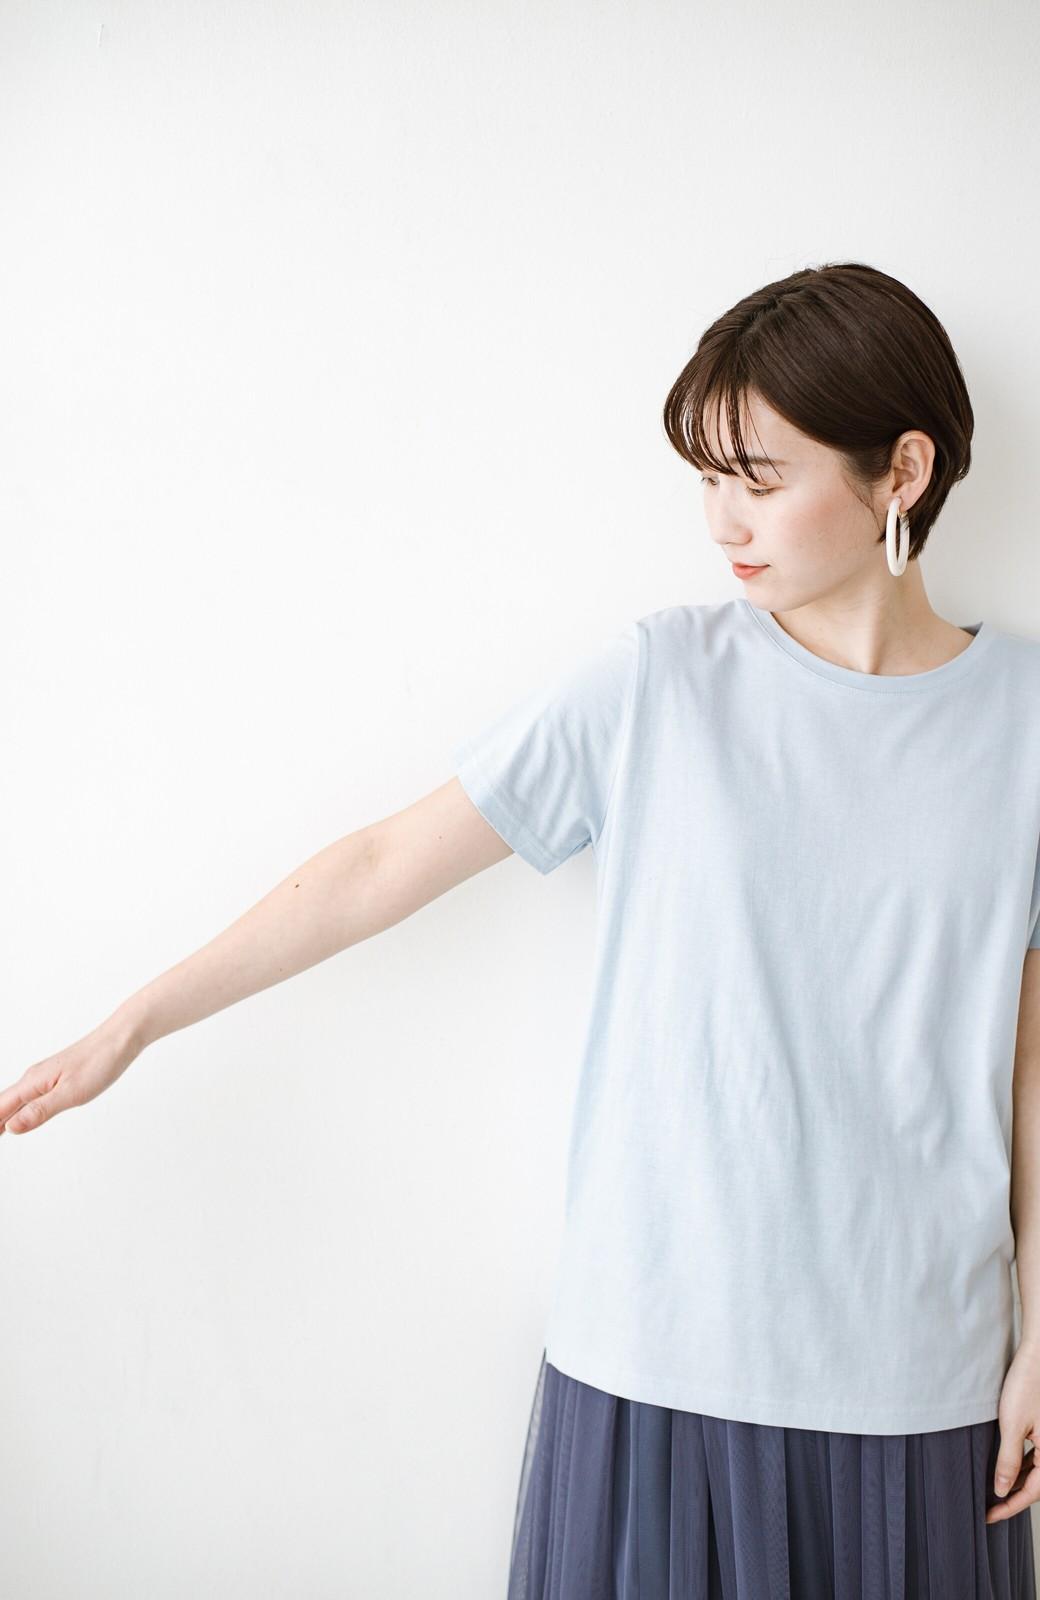 haco! 汗染み軽減加工で安心!1枚でも重ね着にも便利なシンプルTシャツ by ZAMPA <サックスブルー>の商品写真9